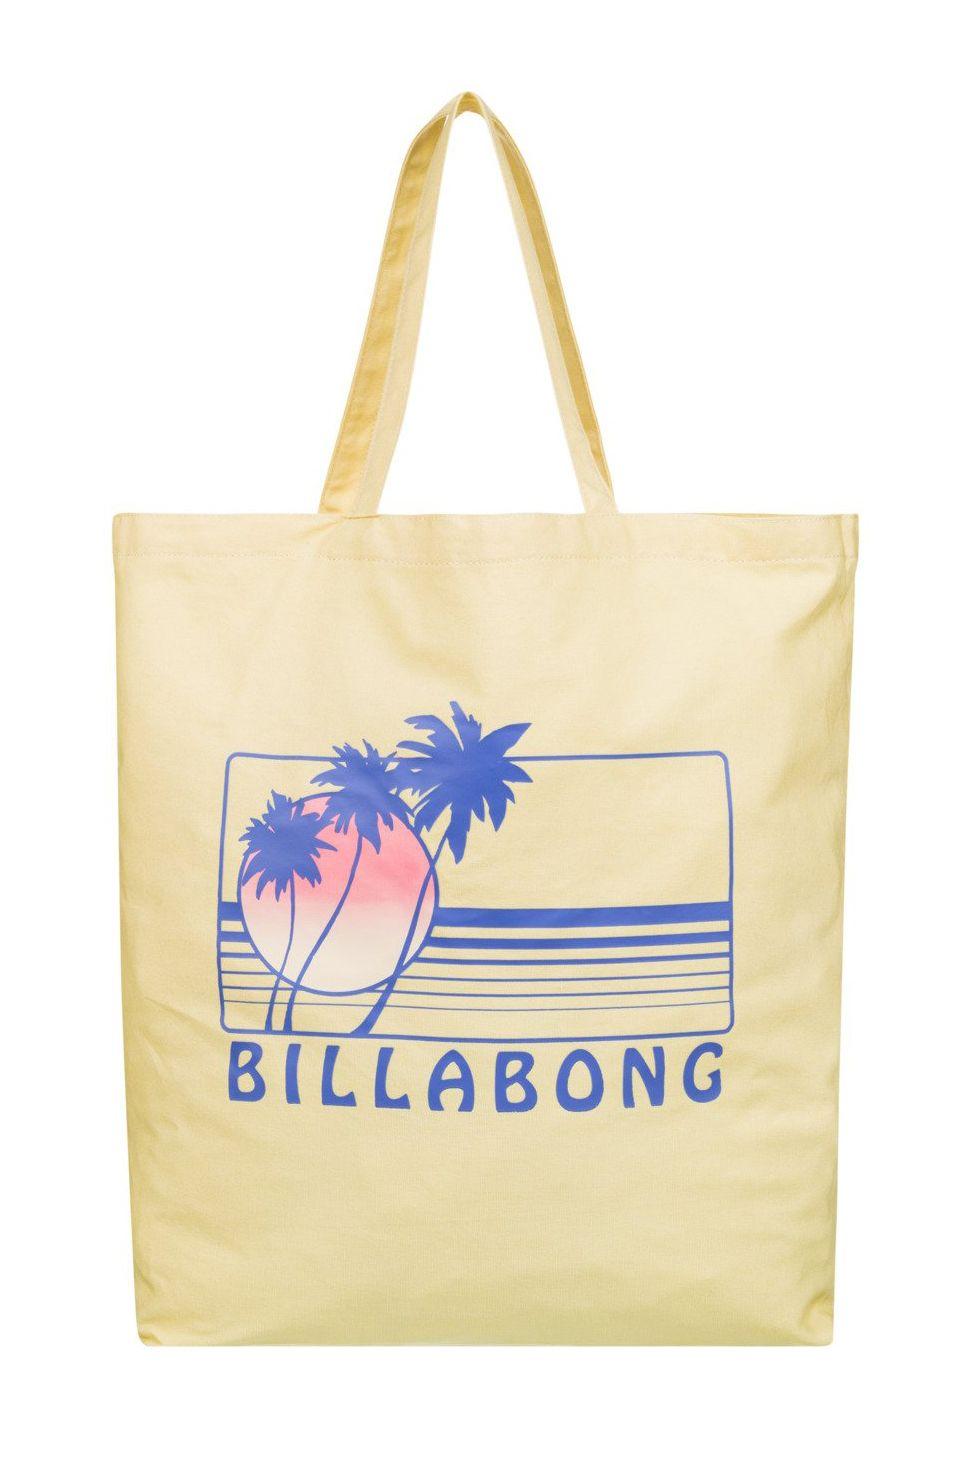 Billabong Bag  SURF TOTE Sunbeam